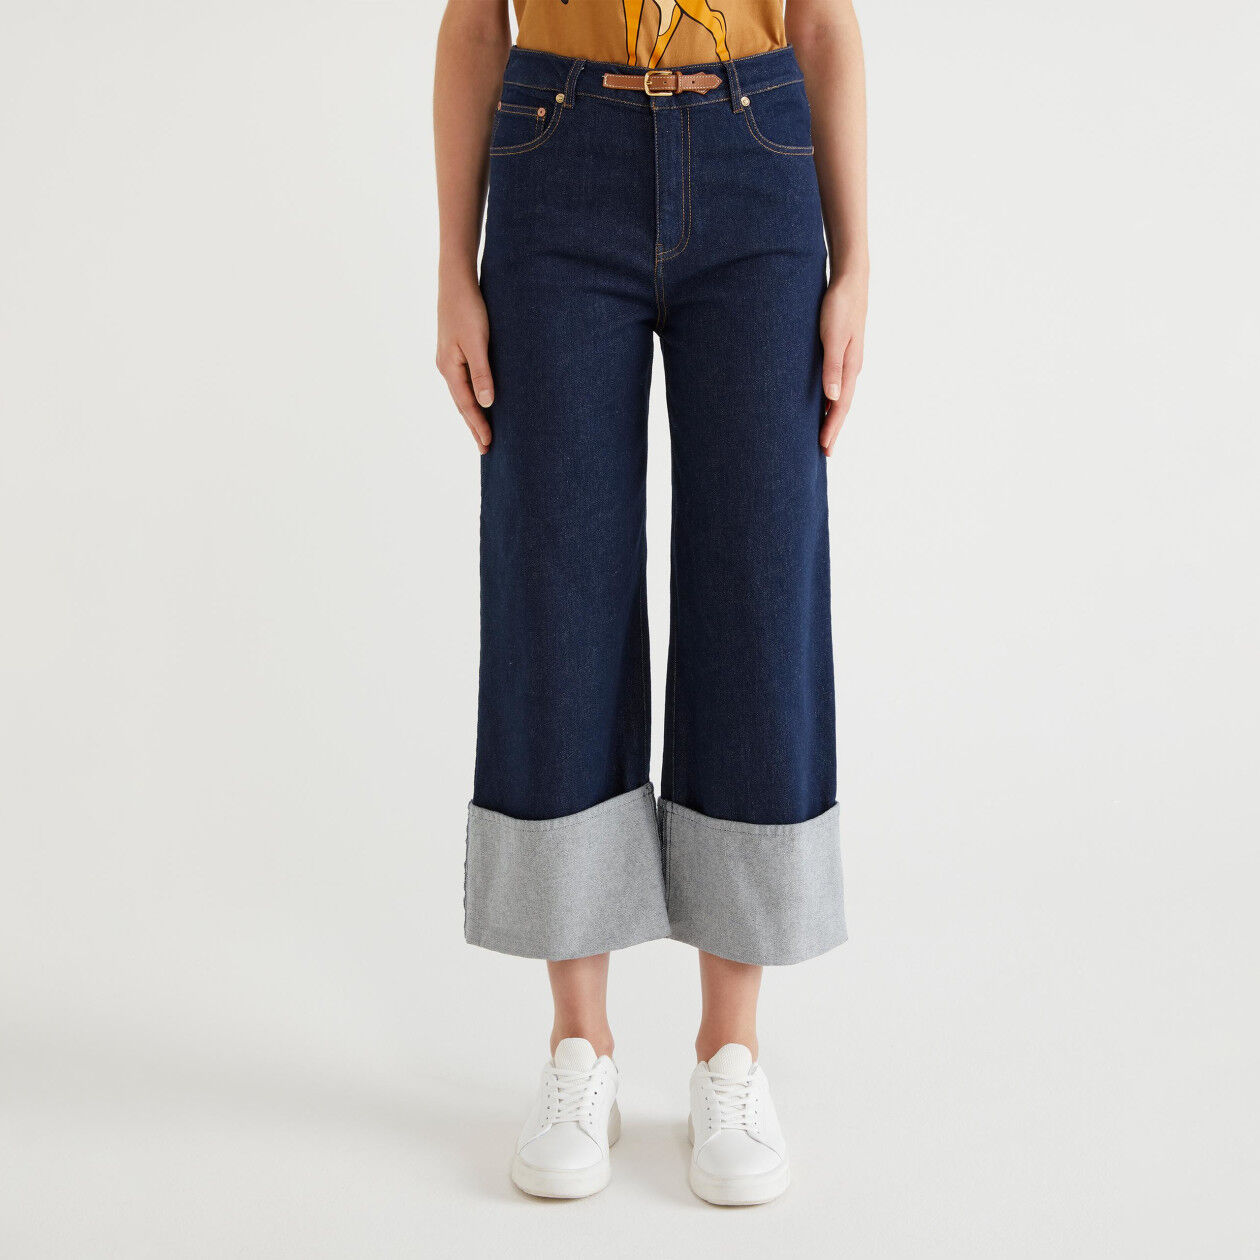 Denim trousers with cuff